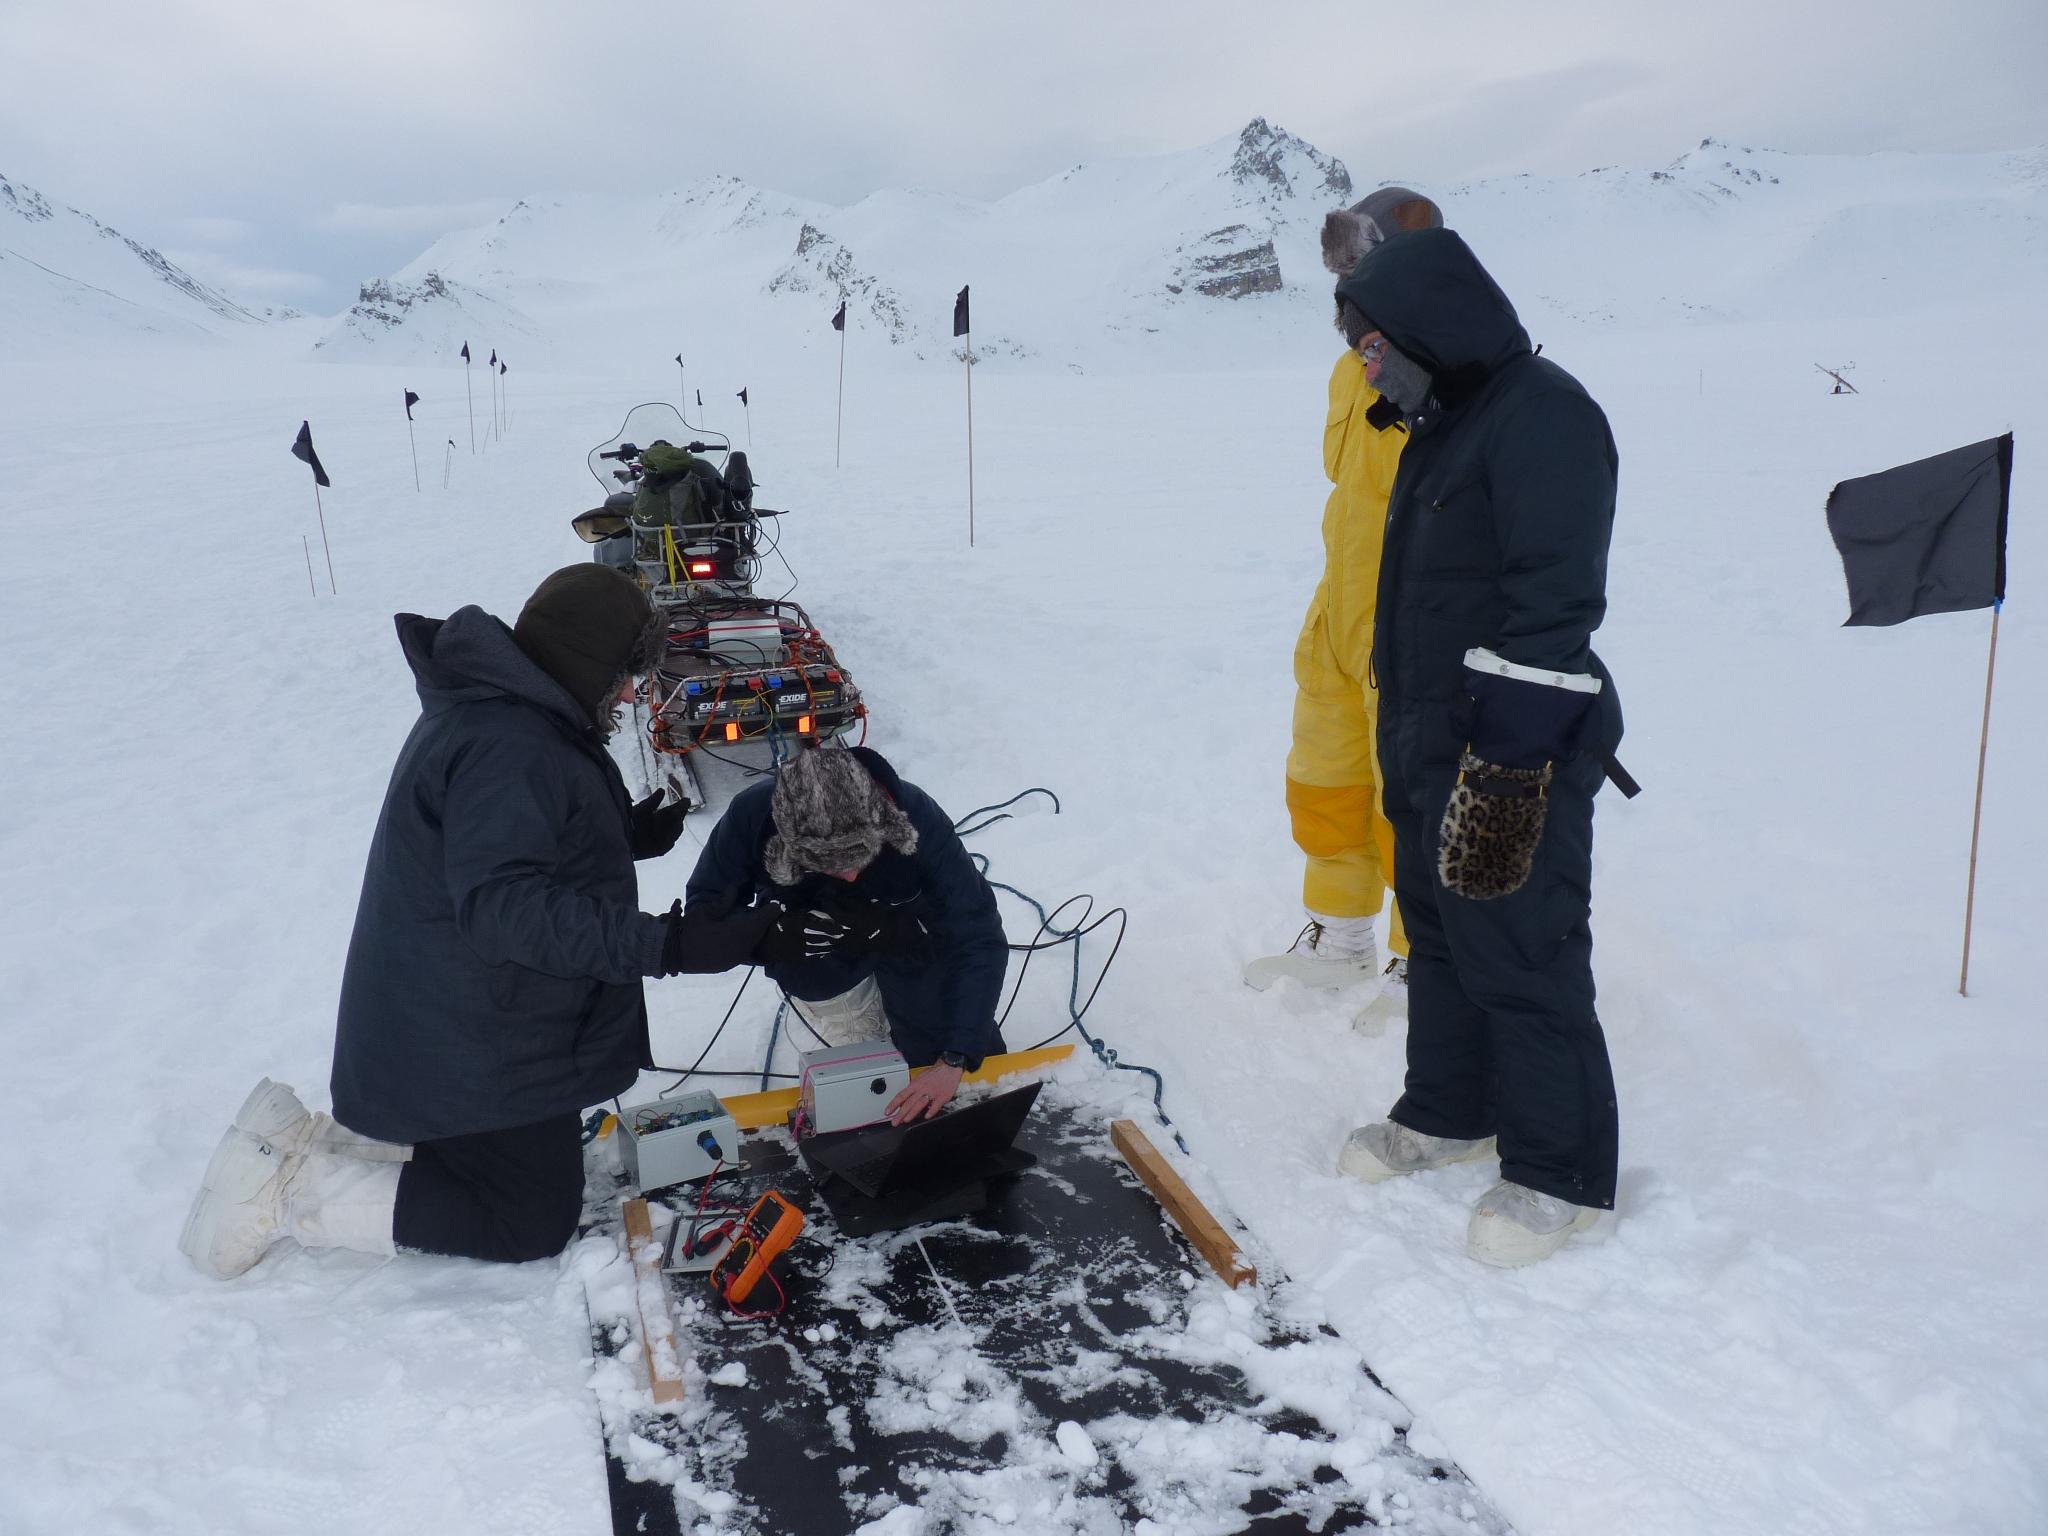 2018-03-26_10-15-18 Svalbard Field Trial MCR